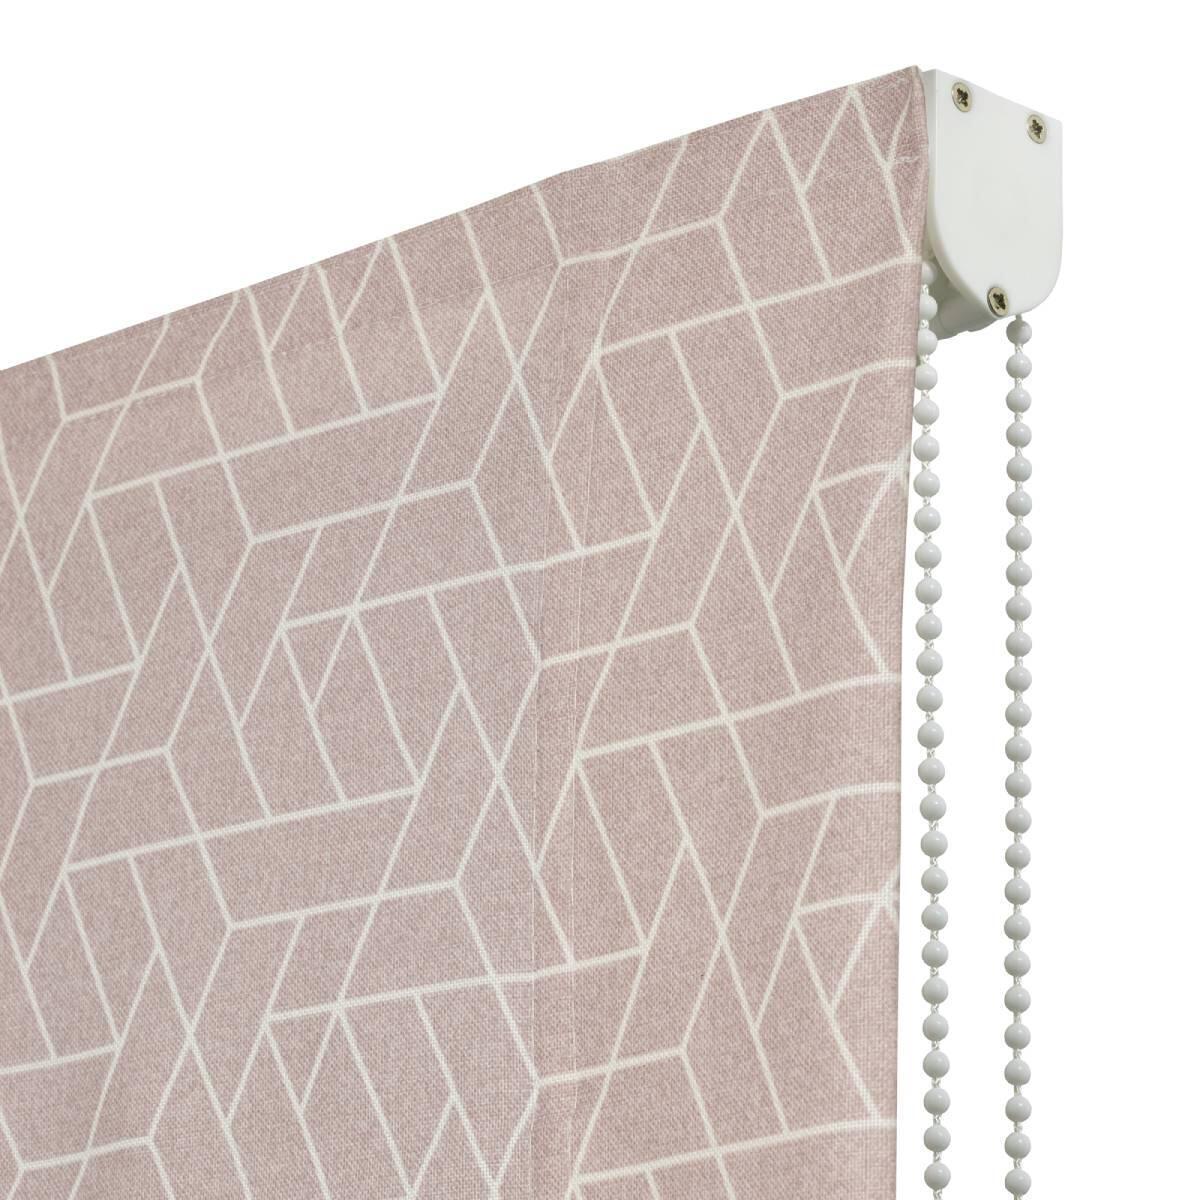 Tenda a pacchetto Geometric rosa 165x175 cm - 1